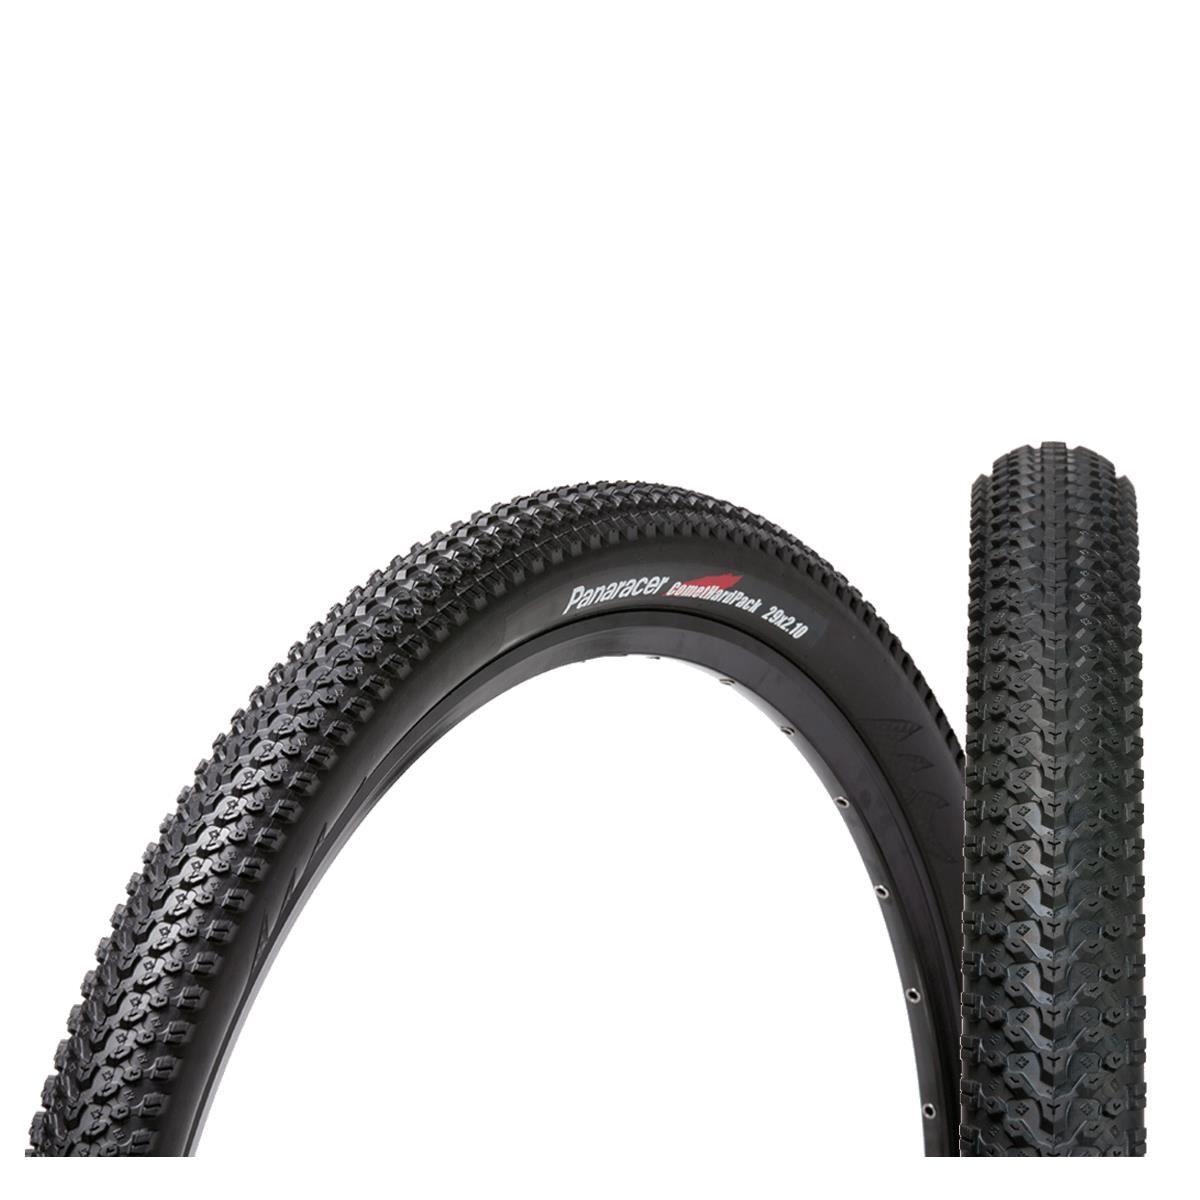 Panaracer Comet Hard Pack Folding Tyre: Black 29X2.1